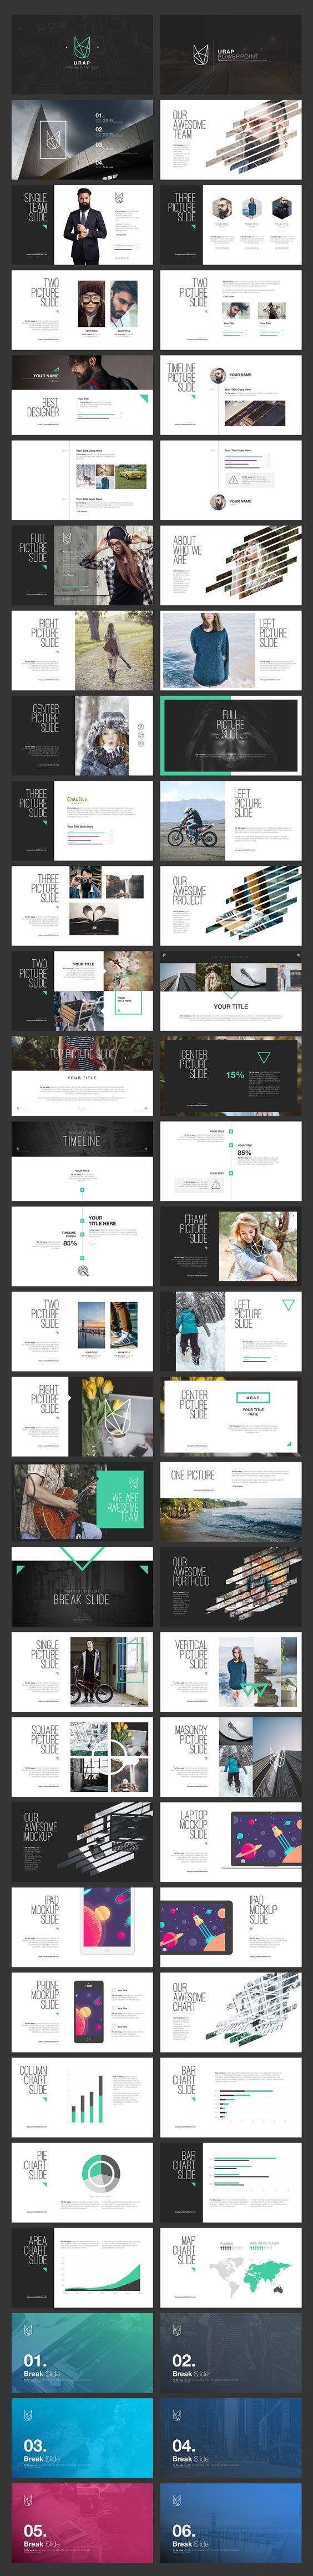 Double Spread | Set 5 | 09 | Presentation | Pinterest | Präsentation ...